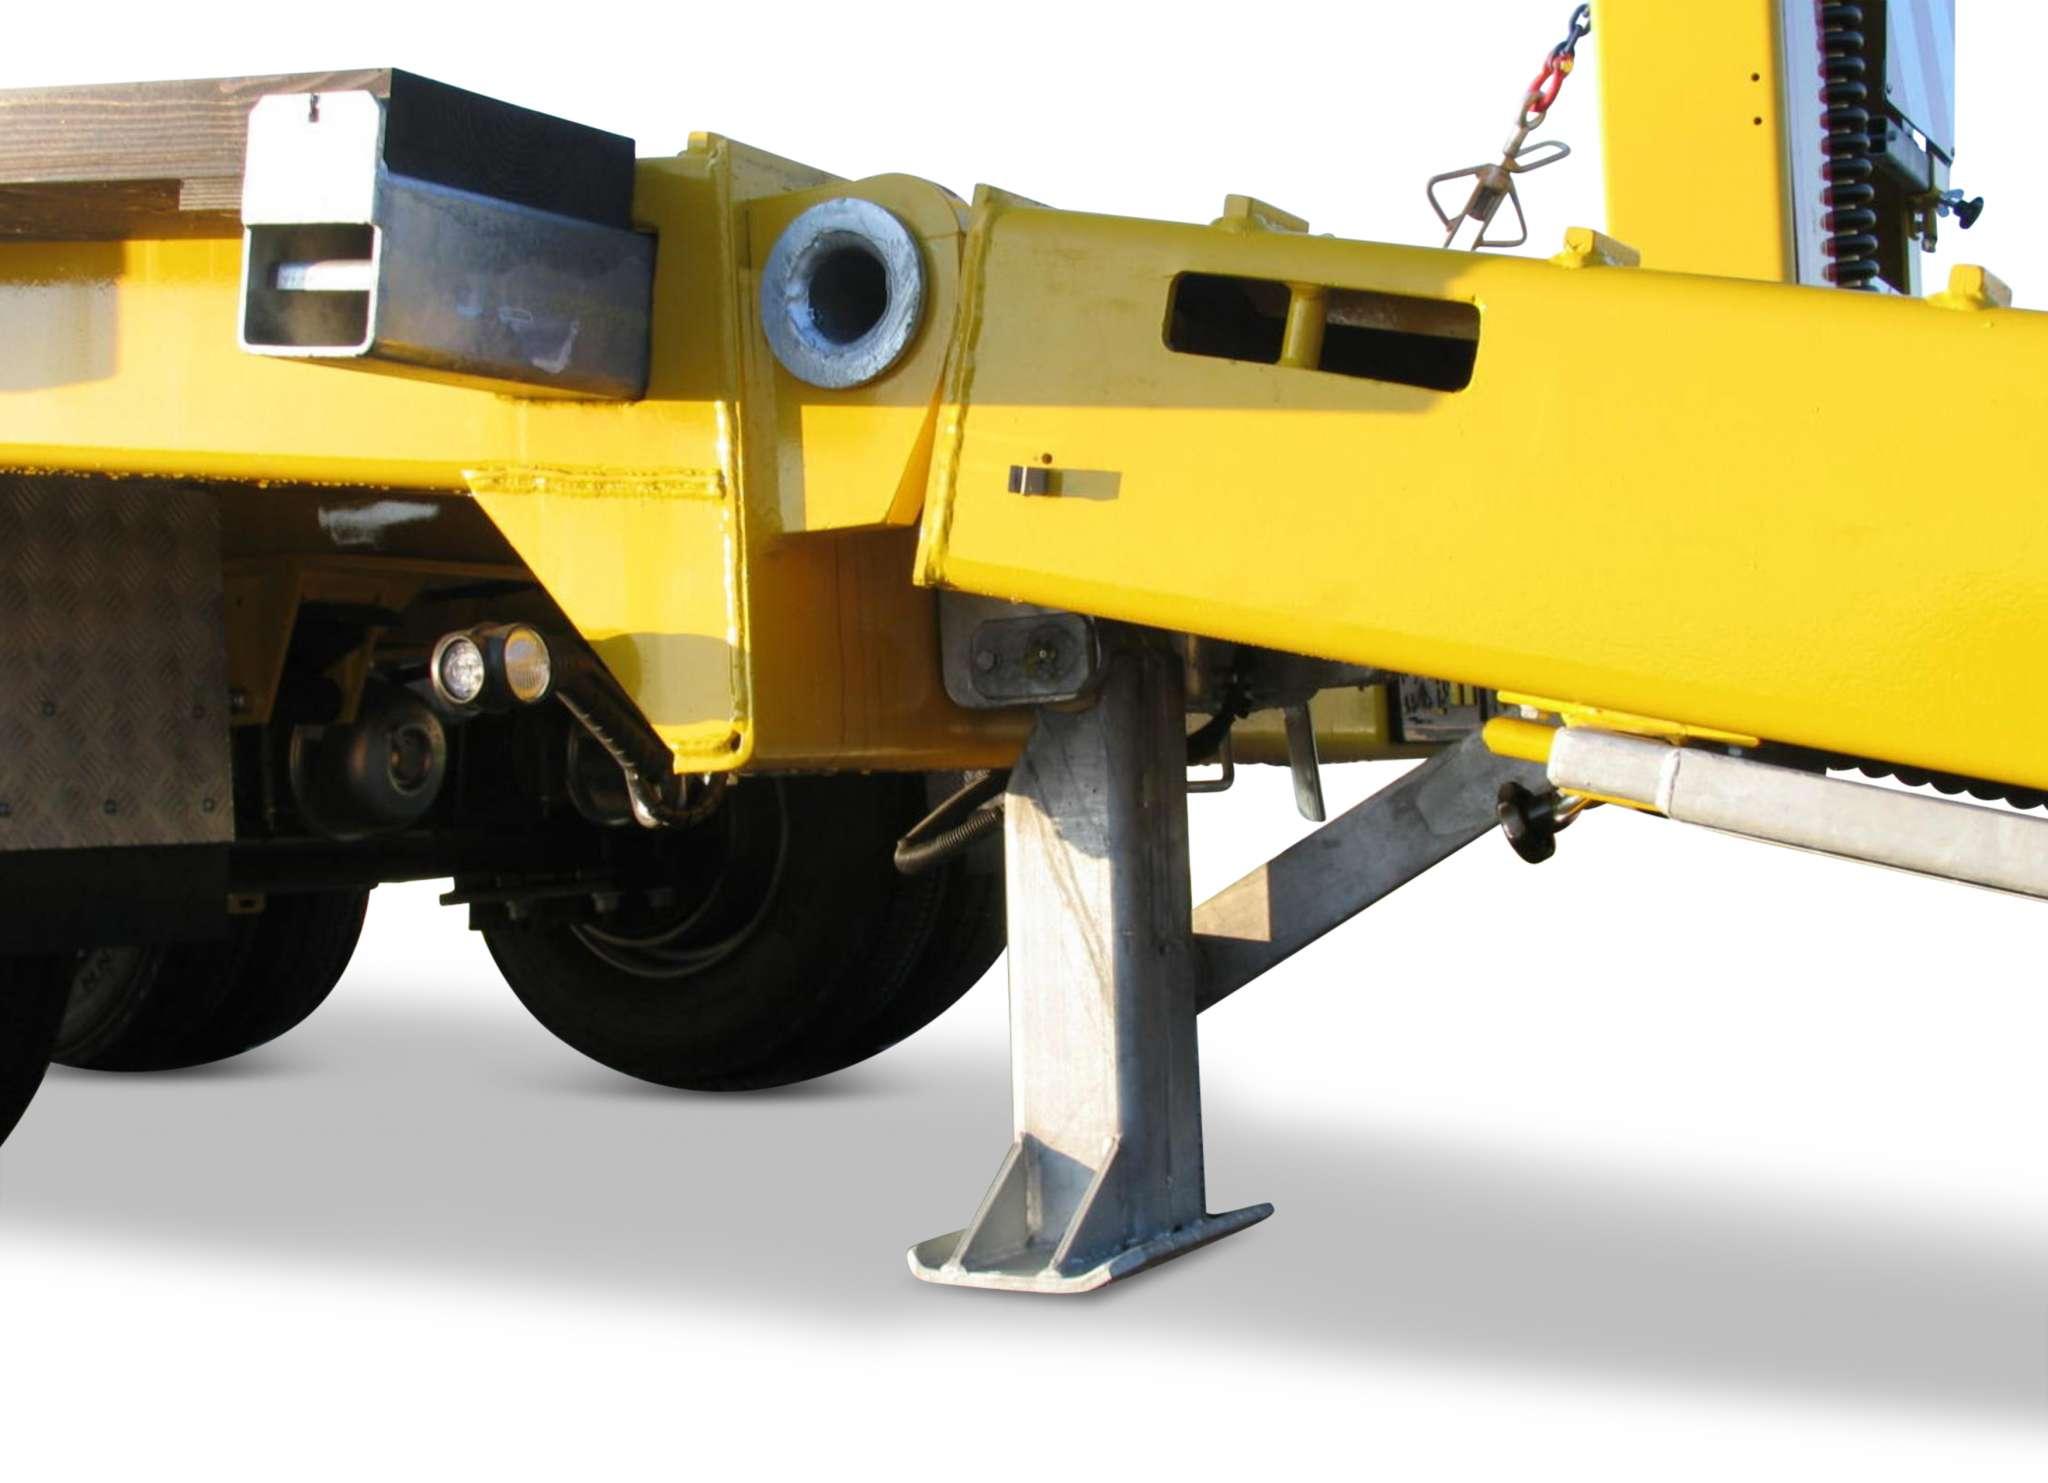 3-axle low loader trailer with offset platform